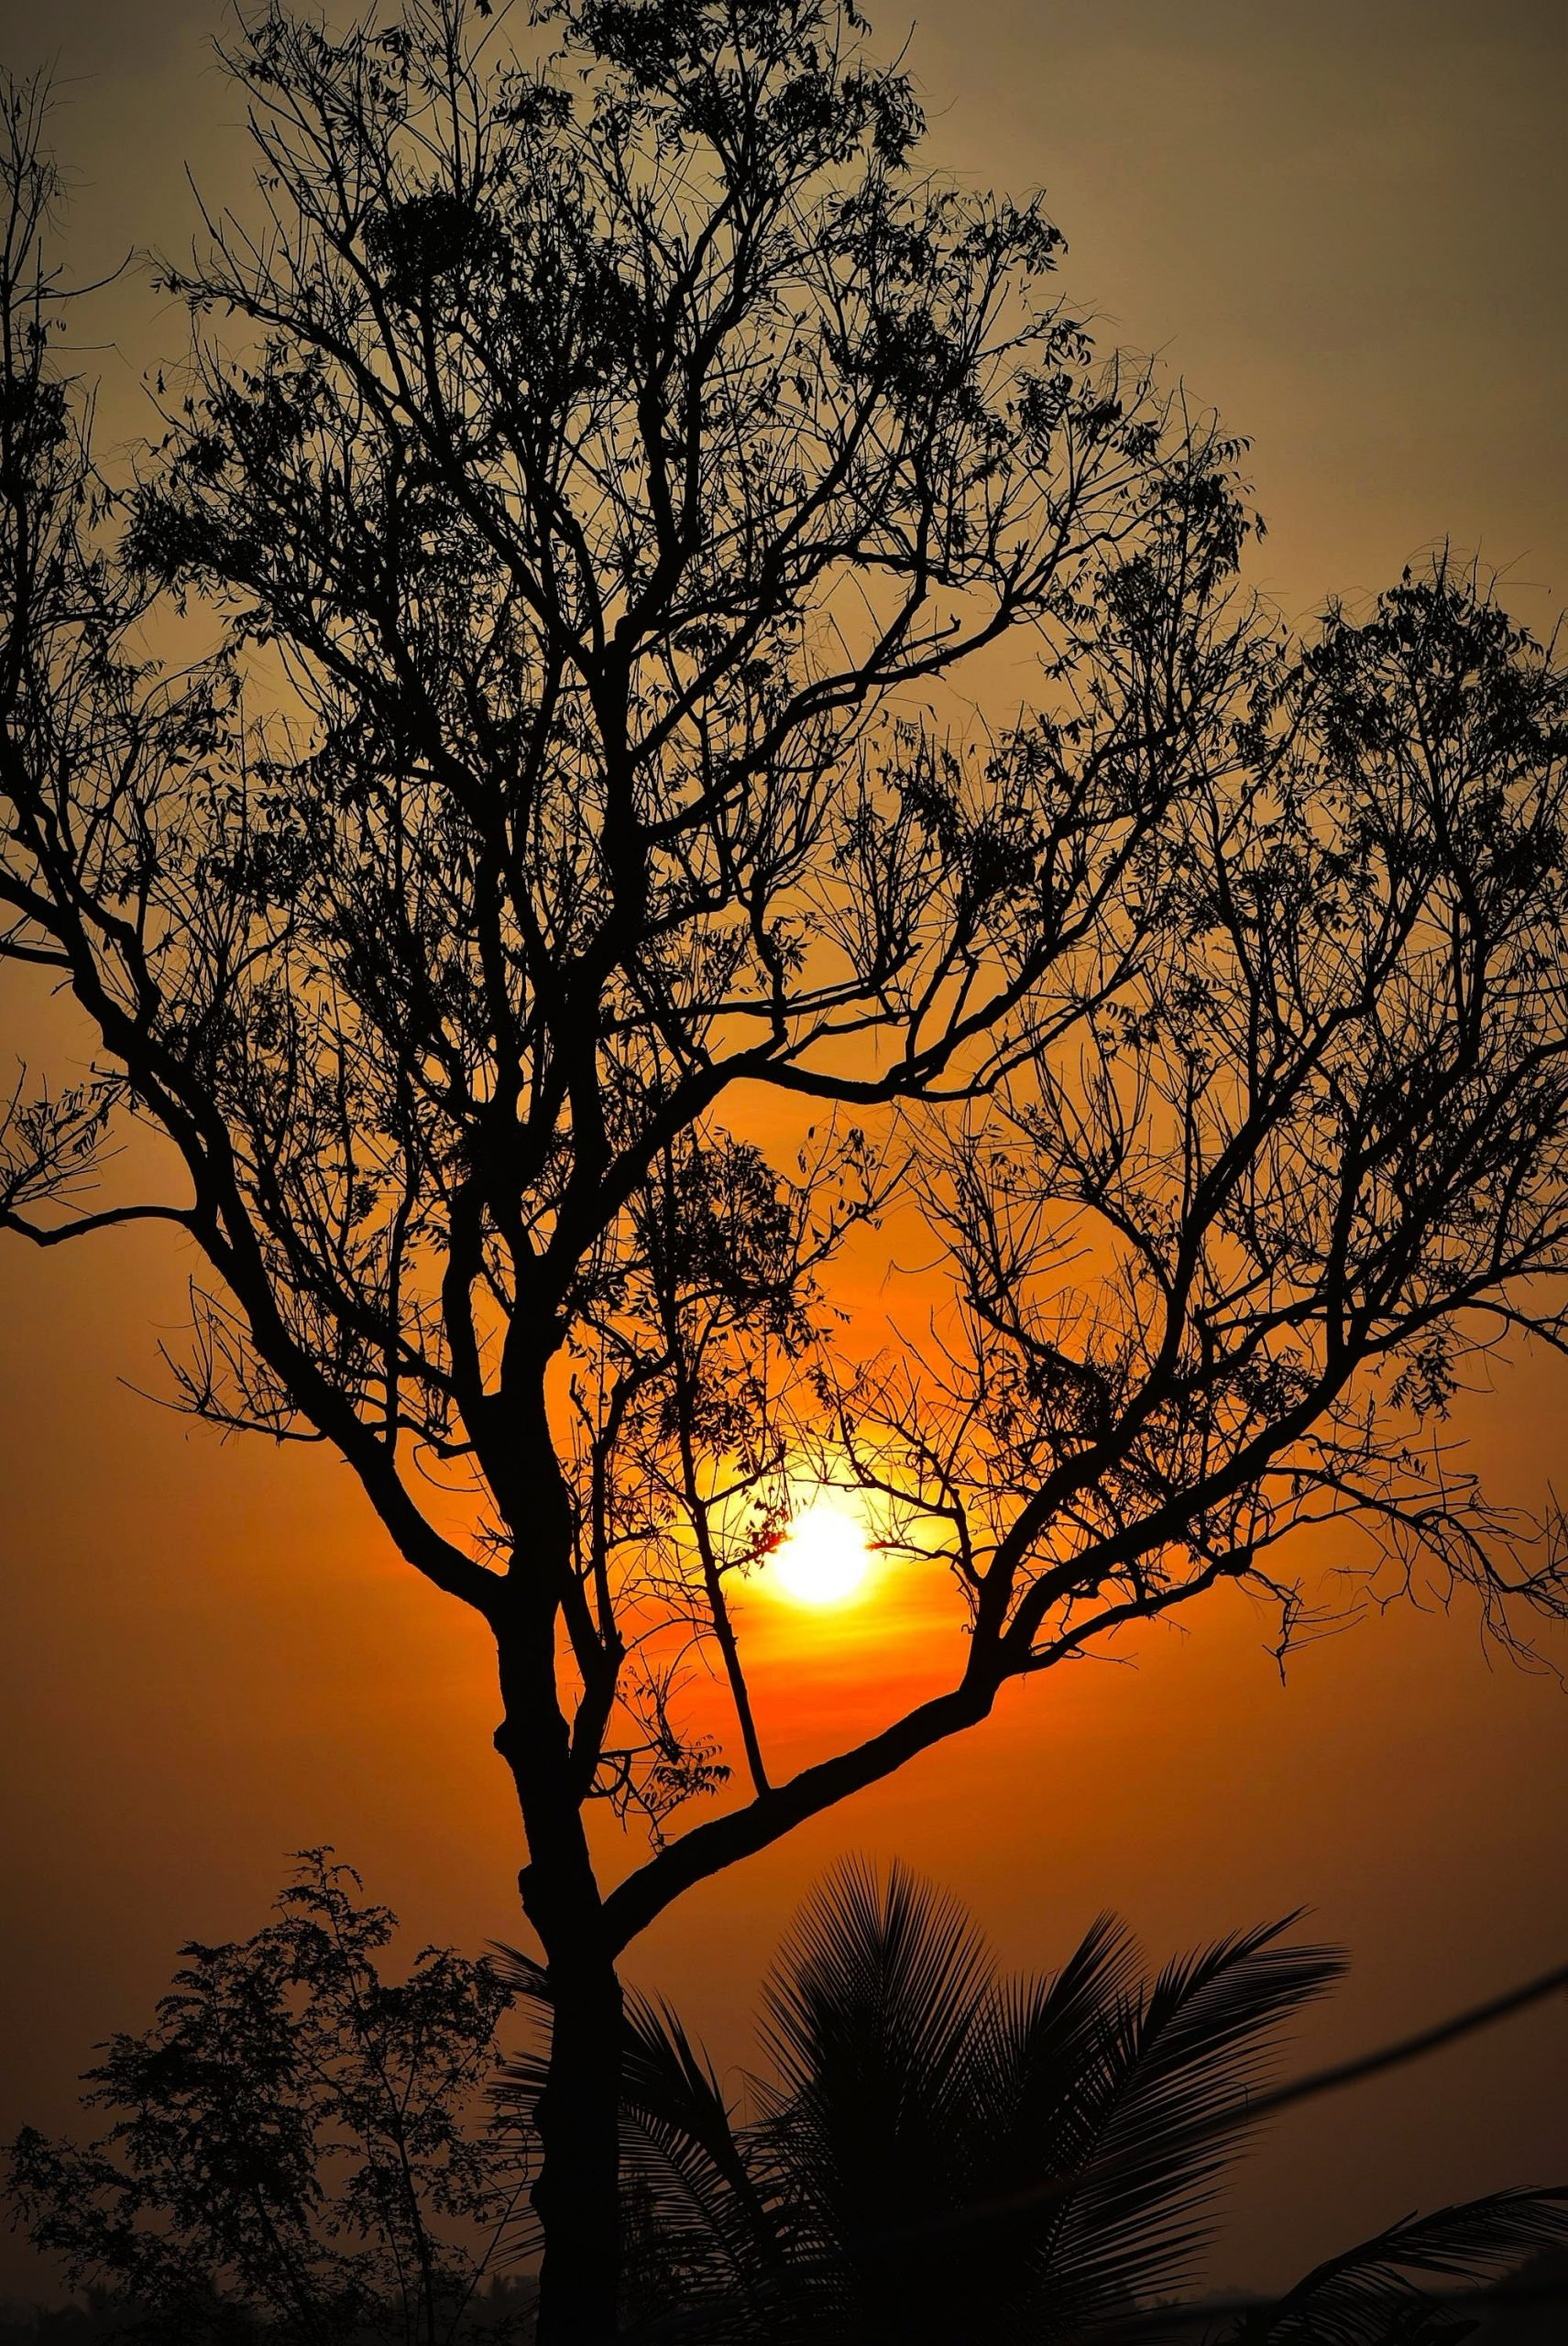 The marvelous sunrise